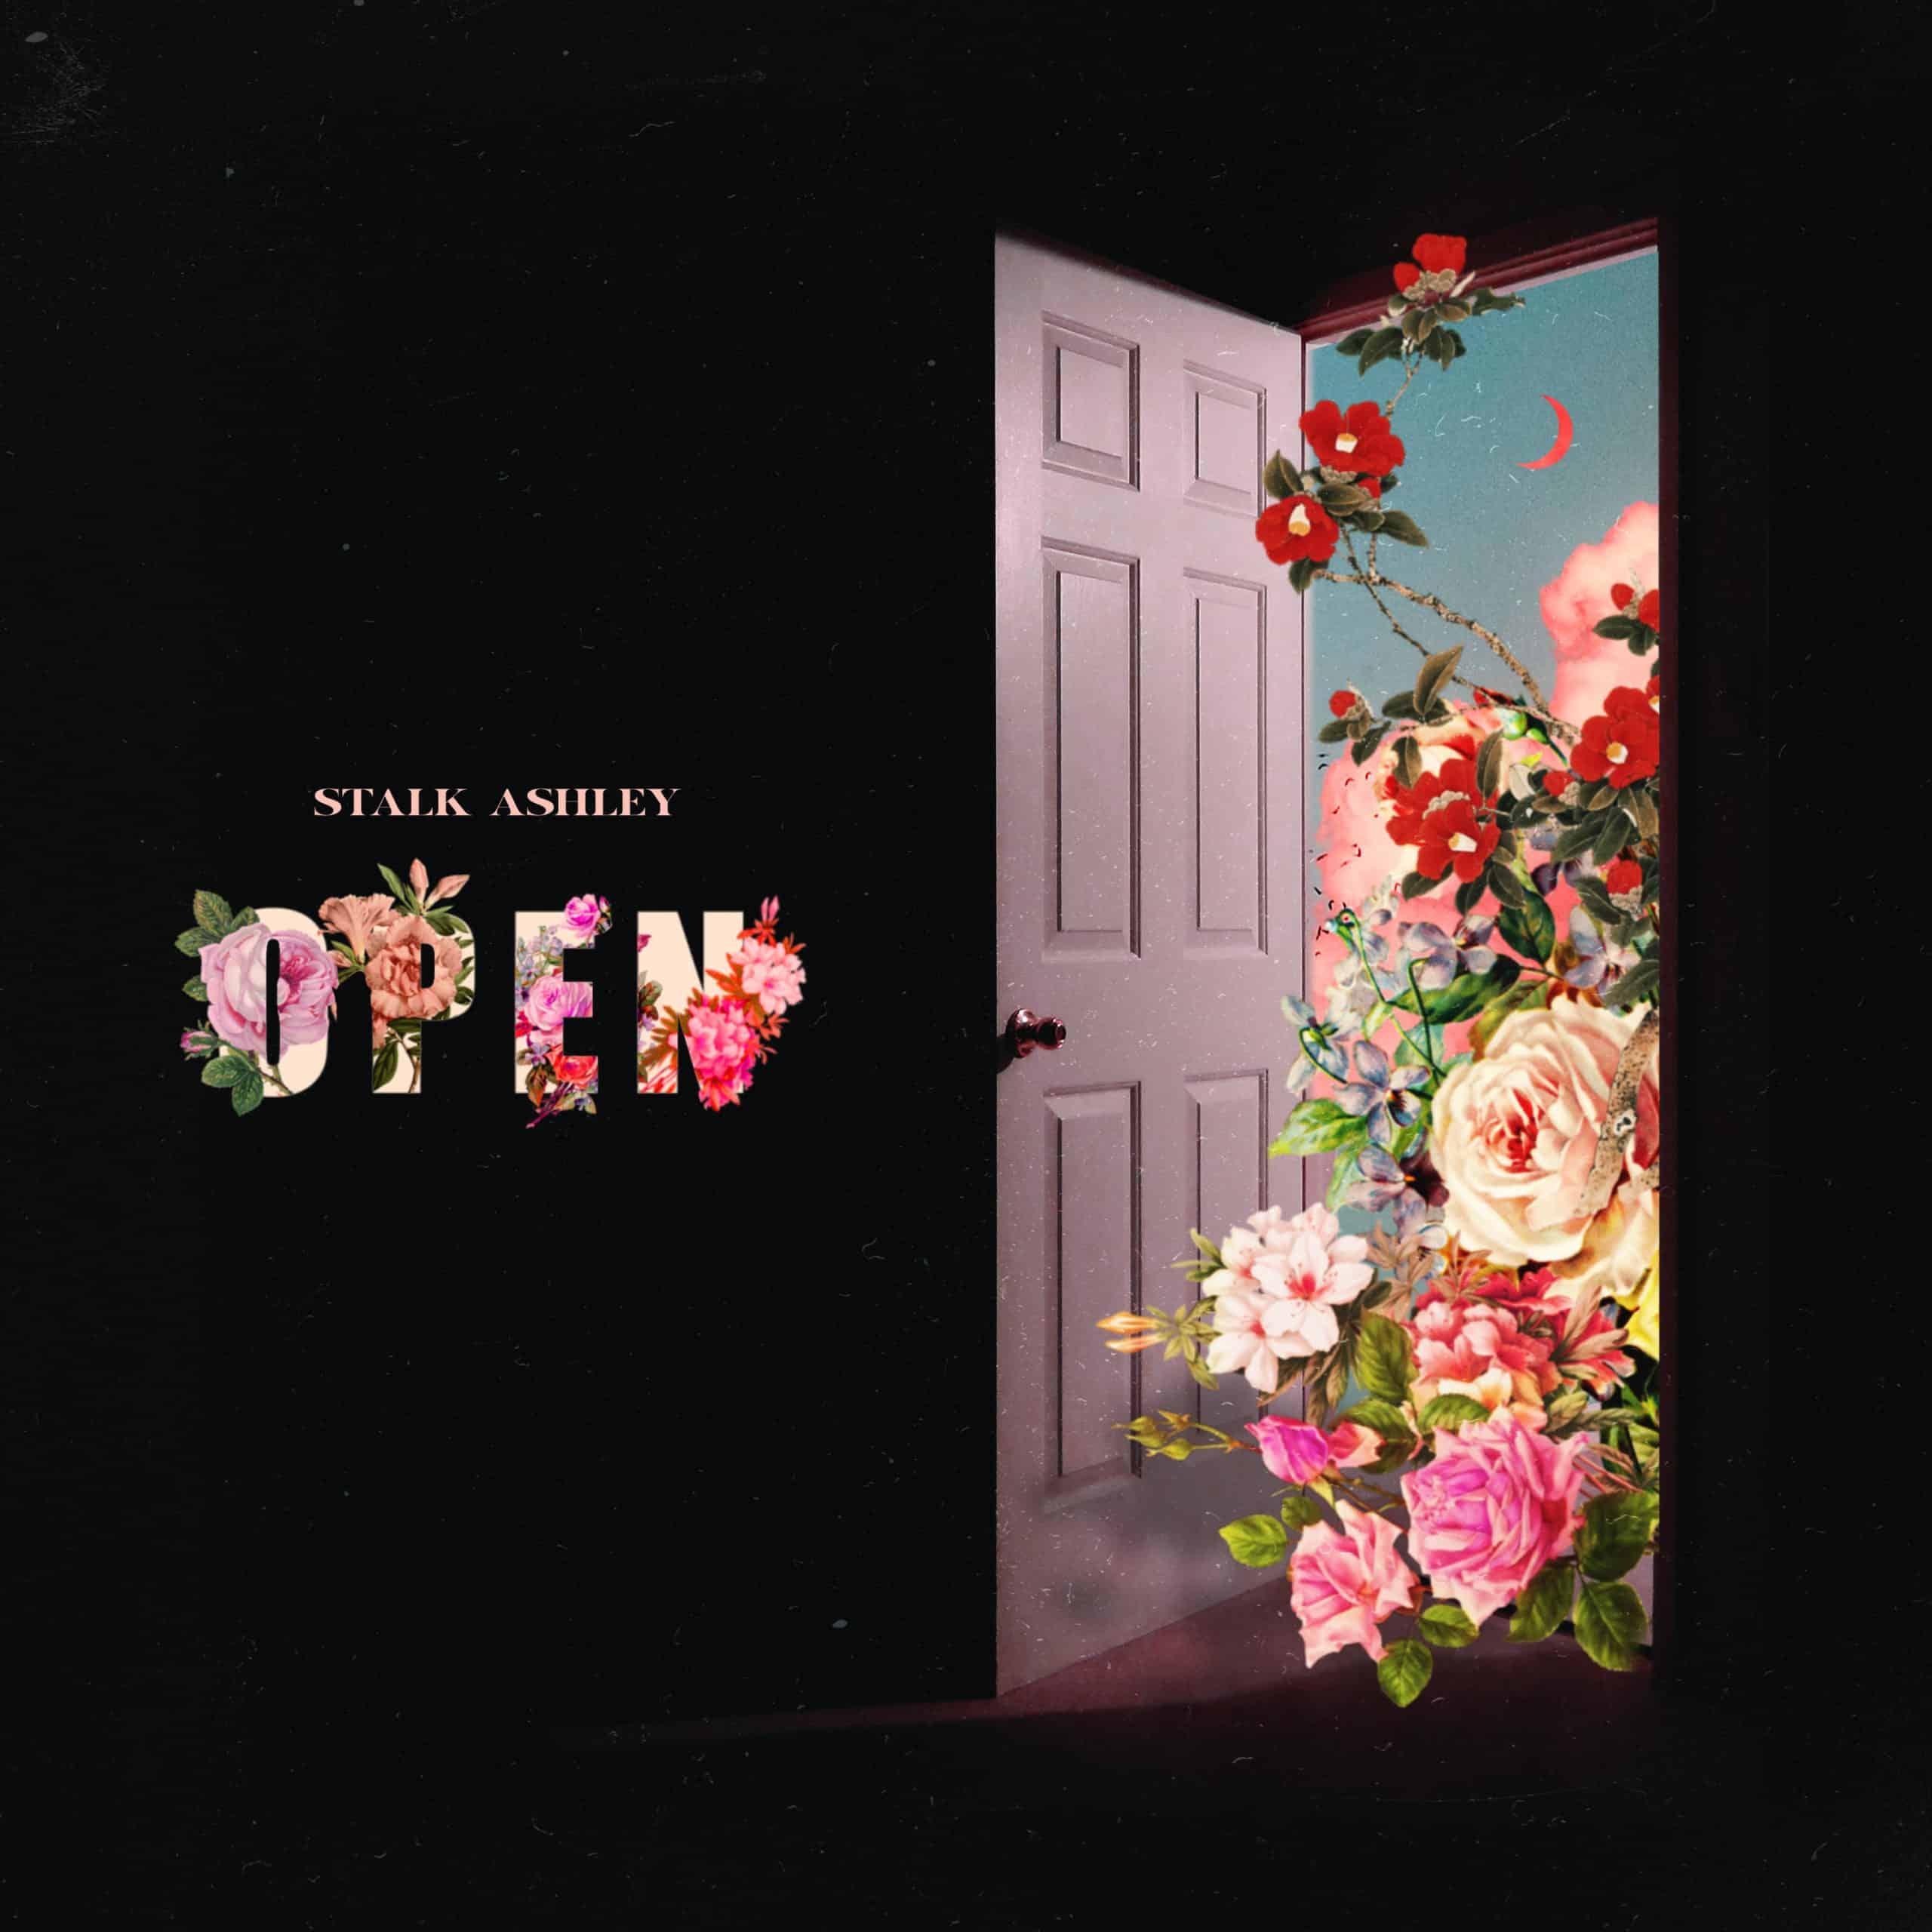 Stalk Ashley - Open - Atlantic Records